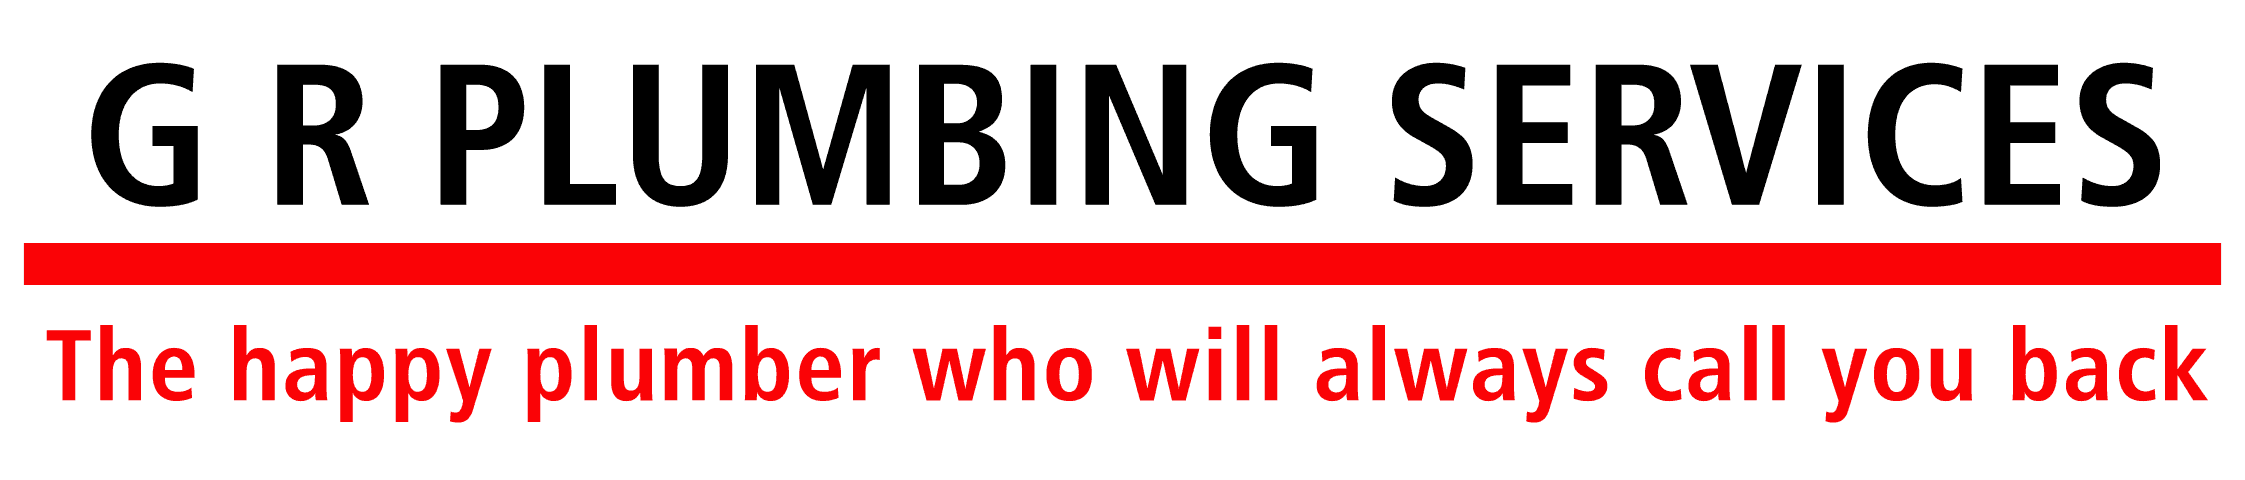 GR Plumbing Services logo